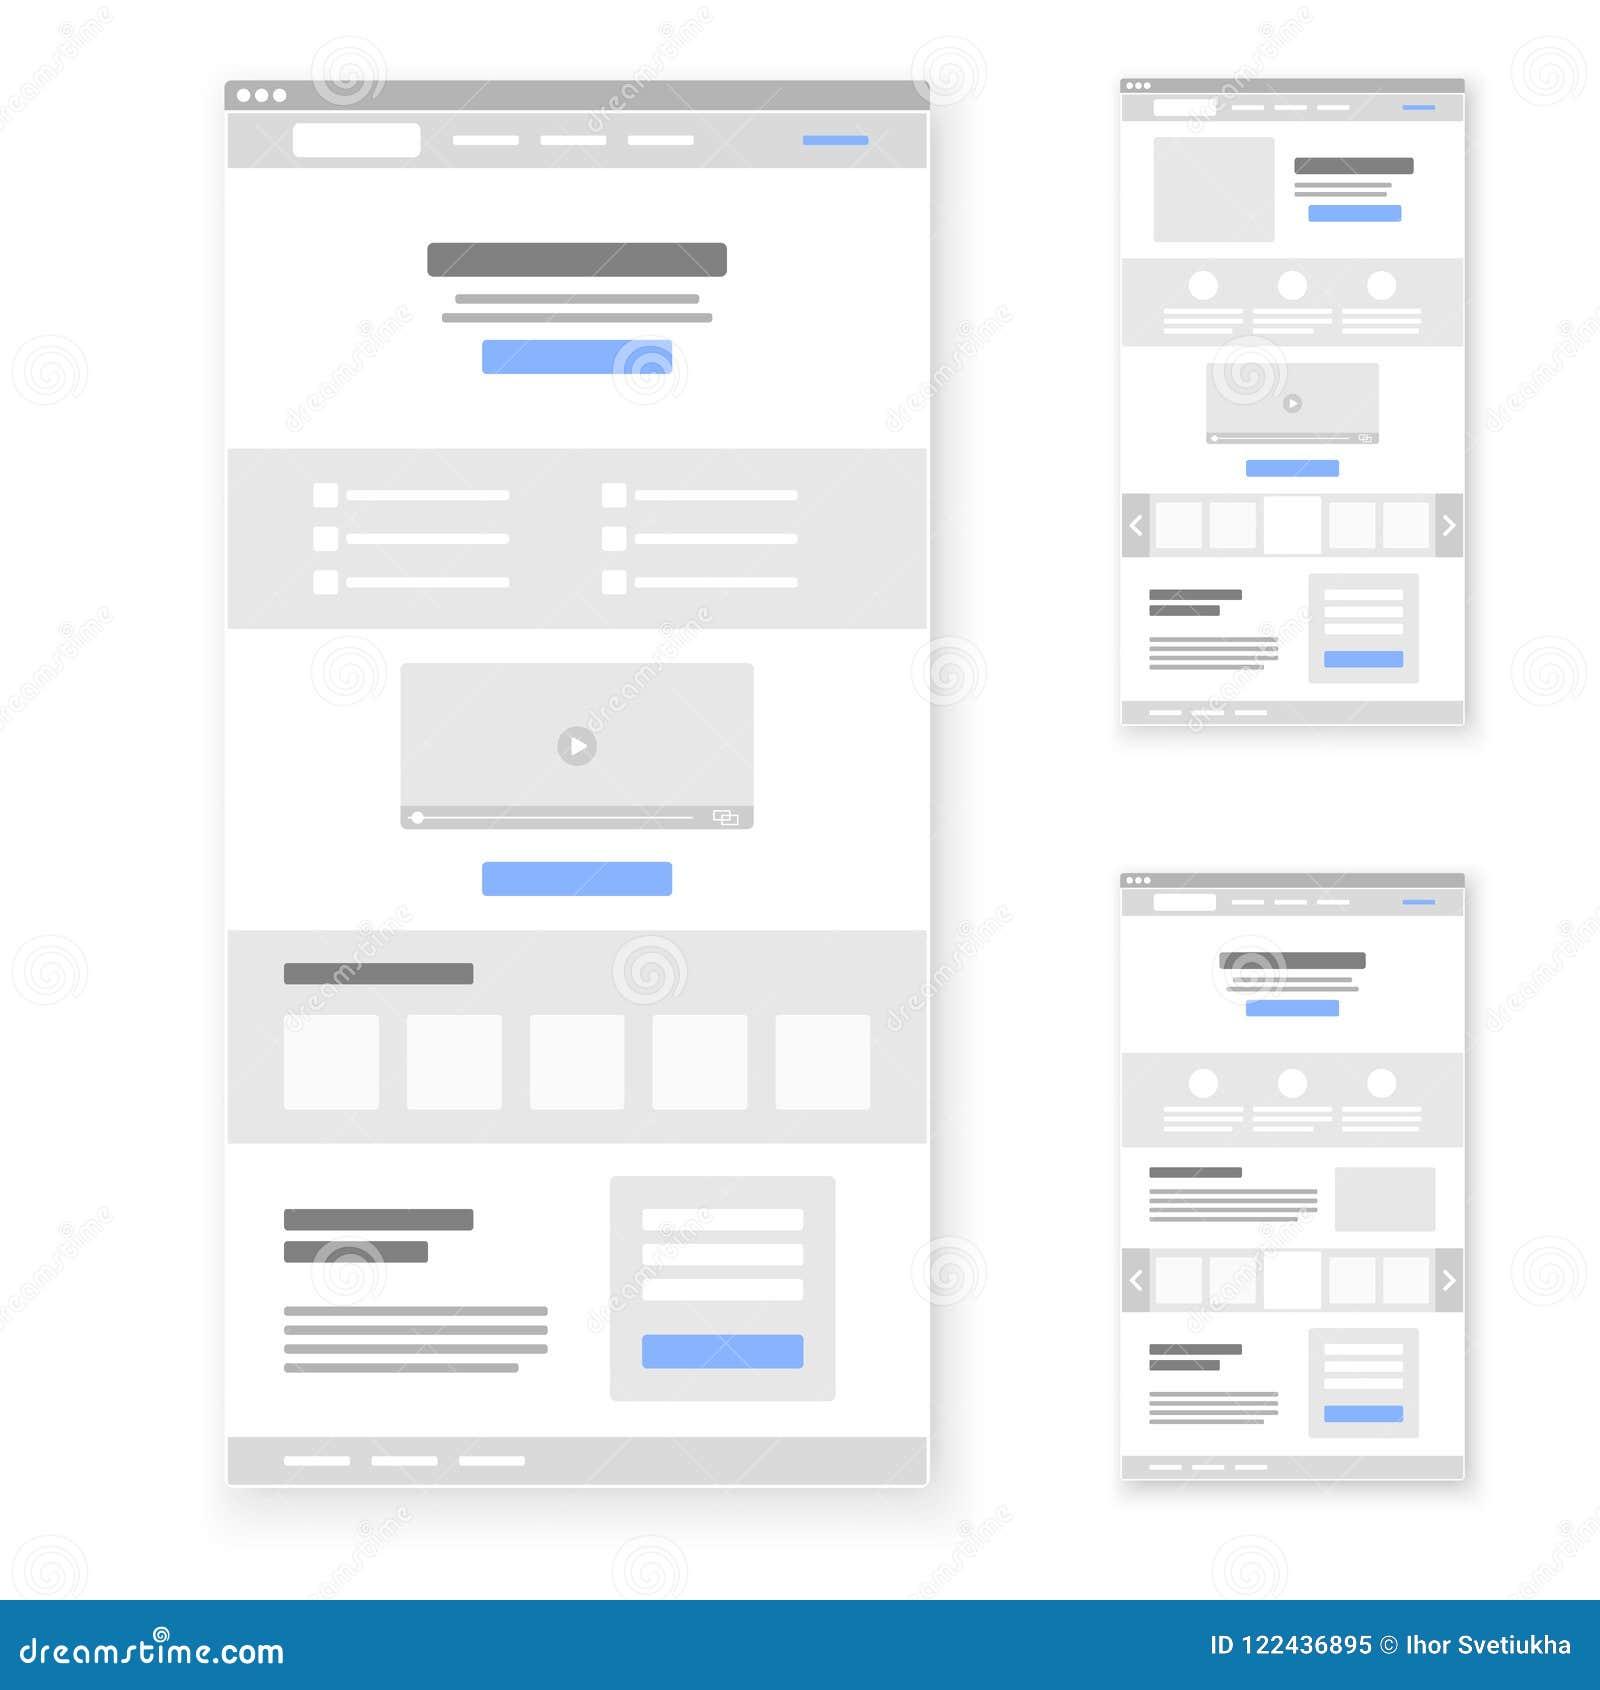 Landing page website wireframe interface template set. Vector illustration